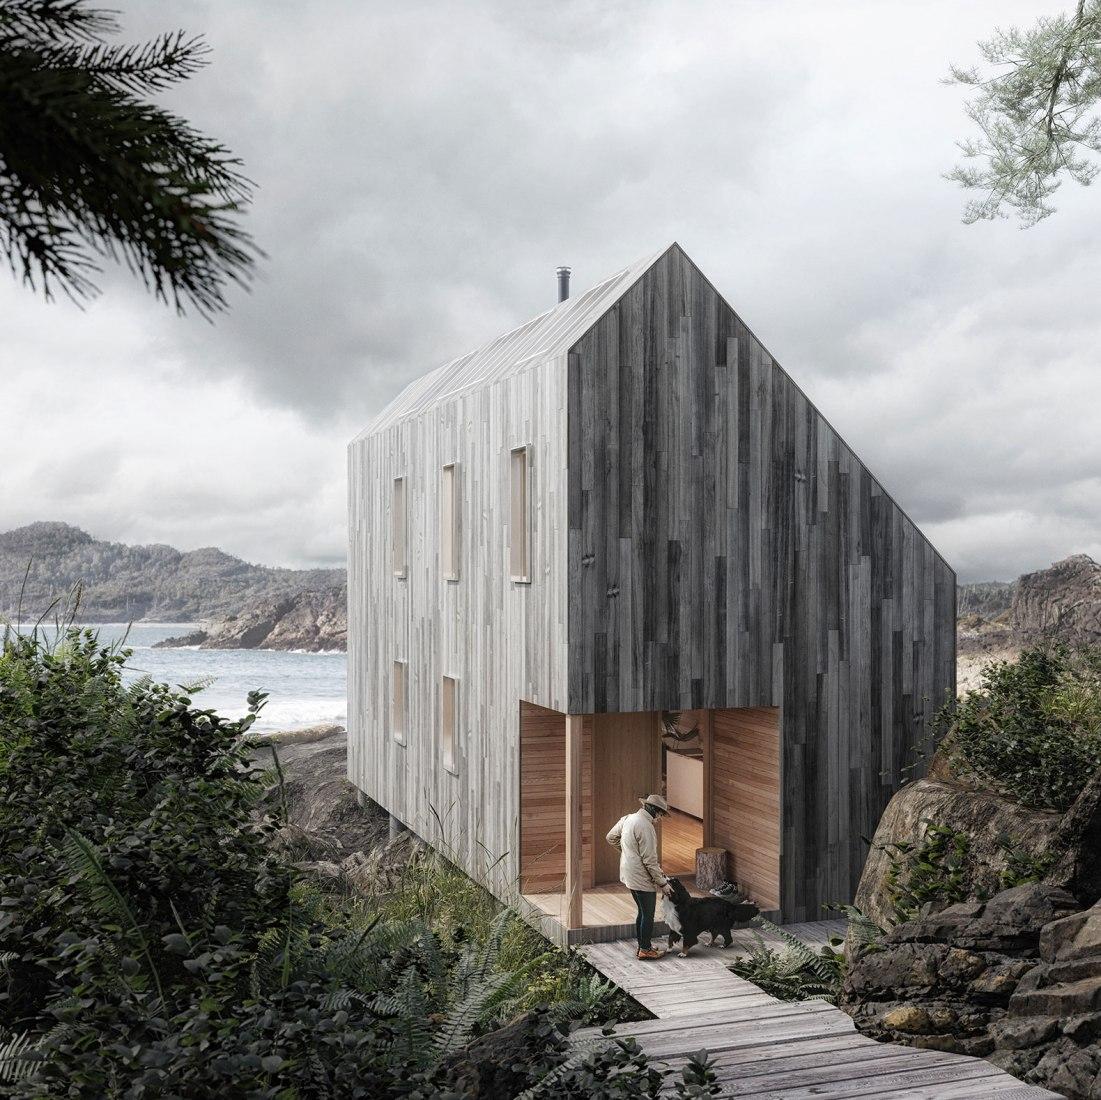 Visualización exterior. Casa Ikea por The Backcountry Hut Company. Fotografía por Plus Visual